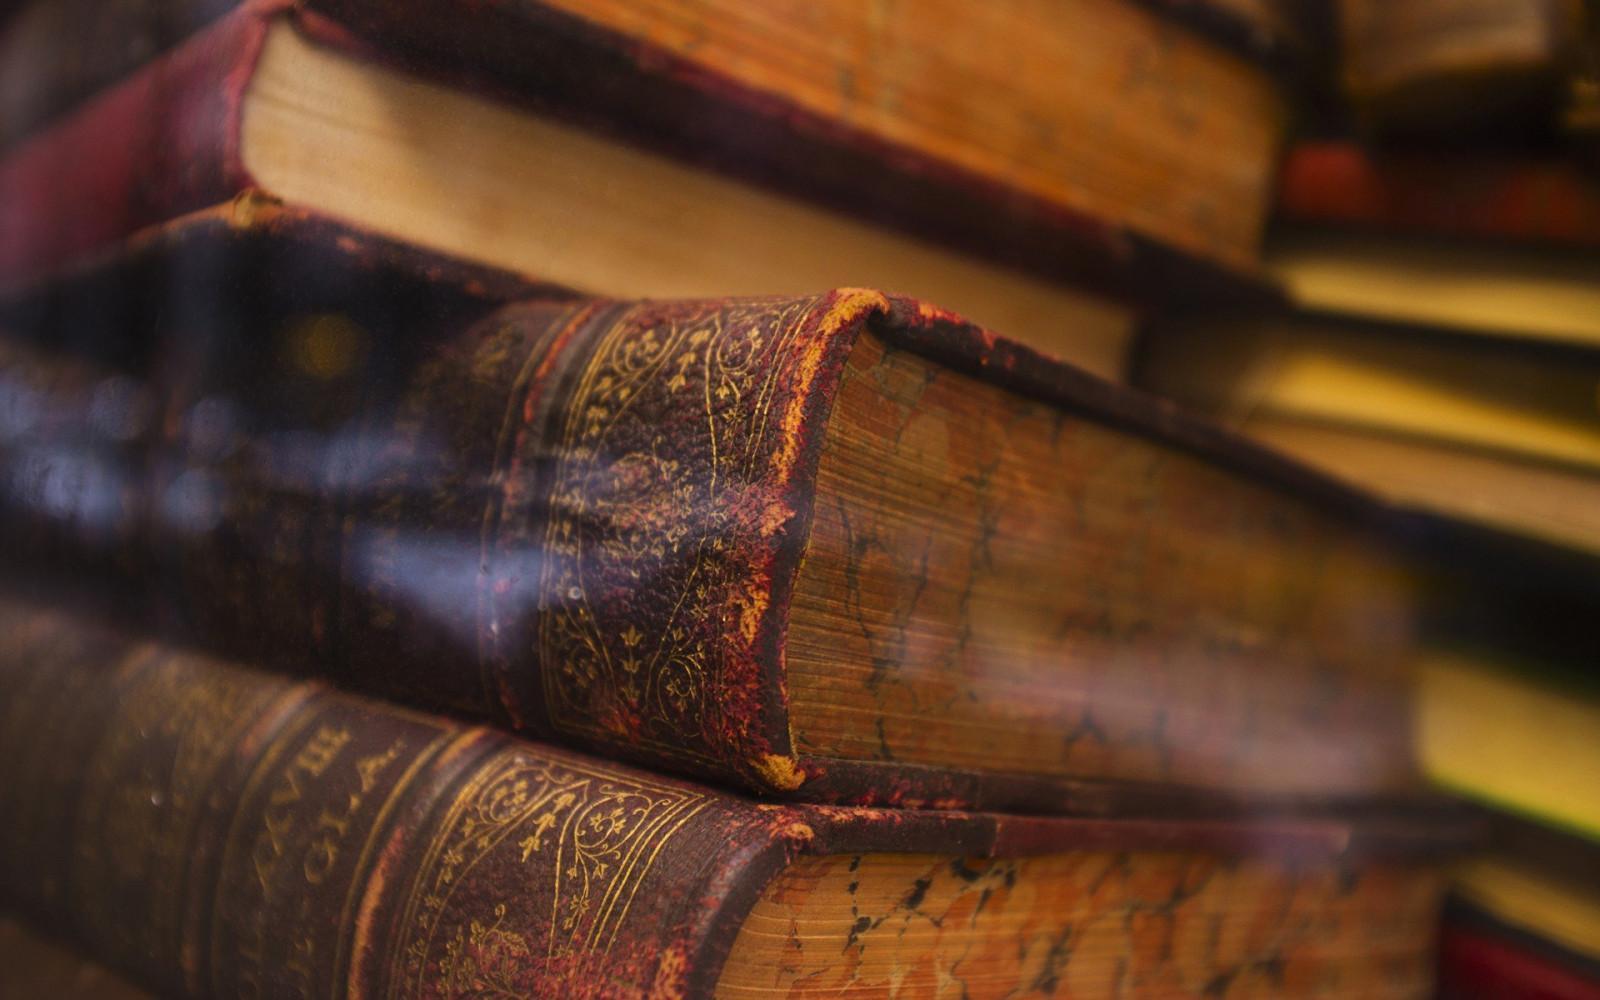 картинки древние книги обои тем менее